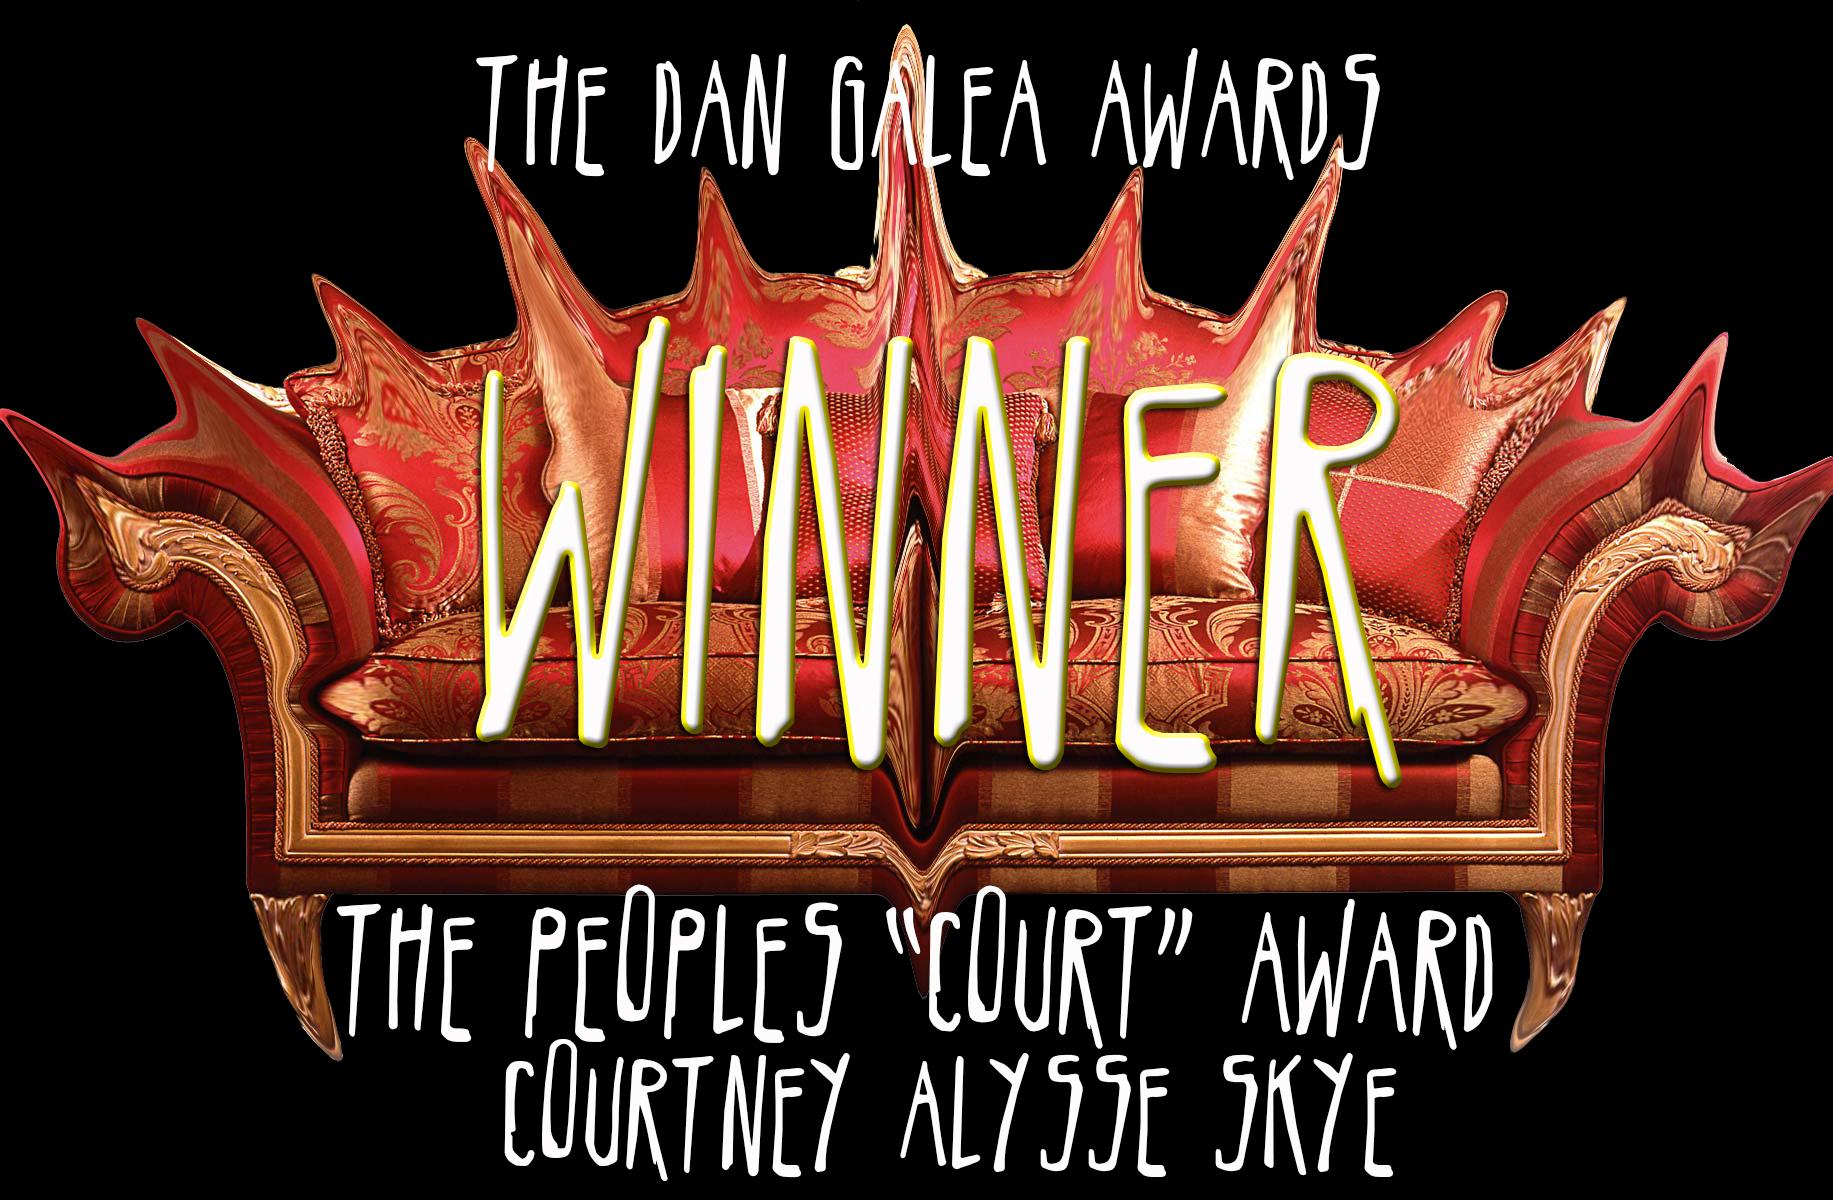 DGawards Courtney Alysse Skye.jpg